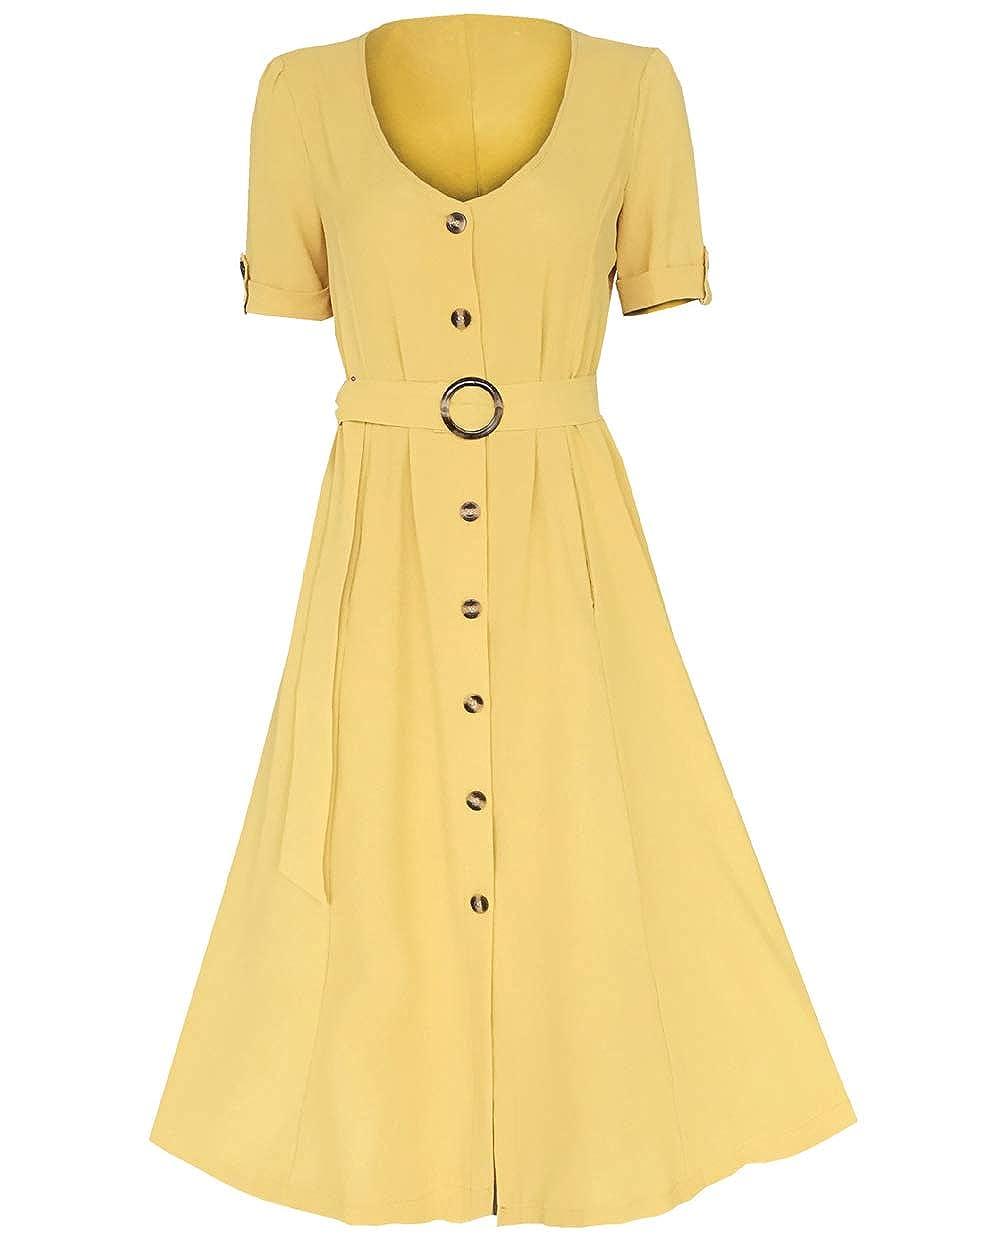 TOPUSH Womens V Neck Short Sleeve Button Down Tie Waist Striped Shirt Midi Dress